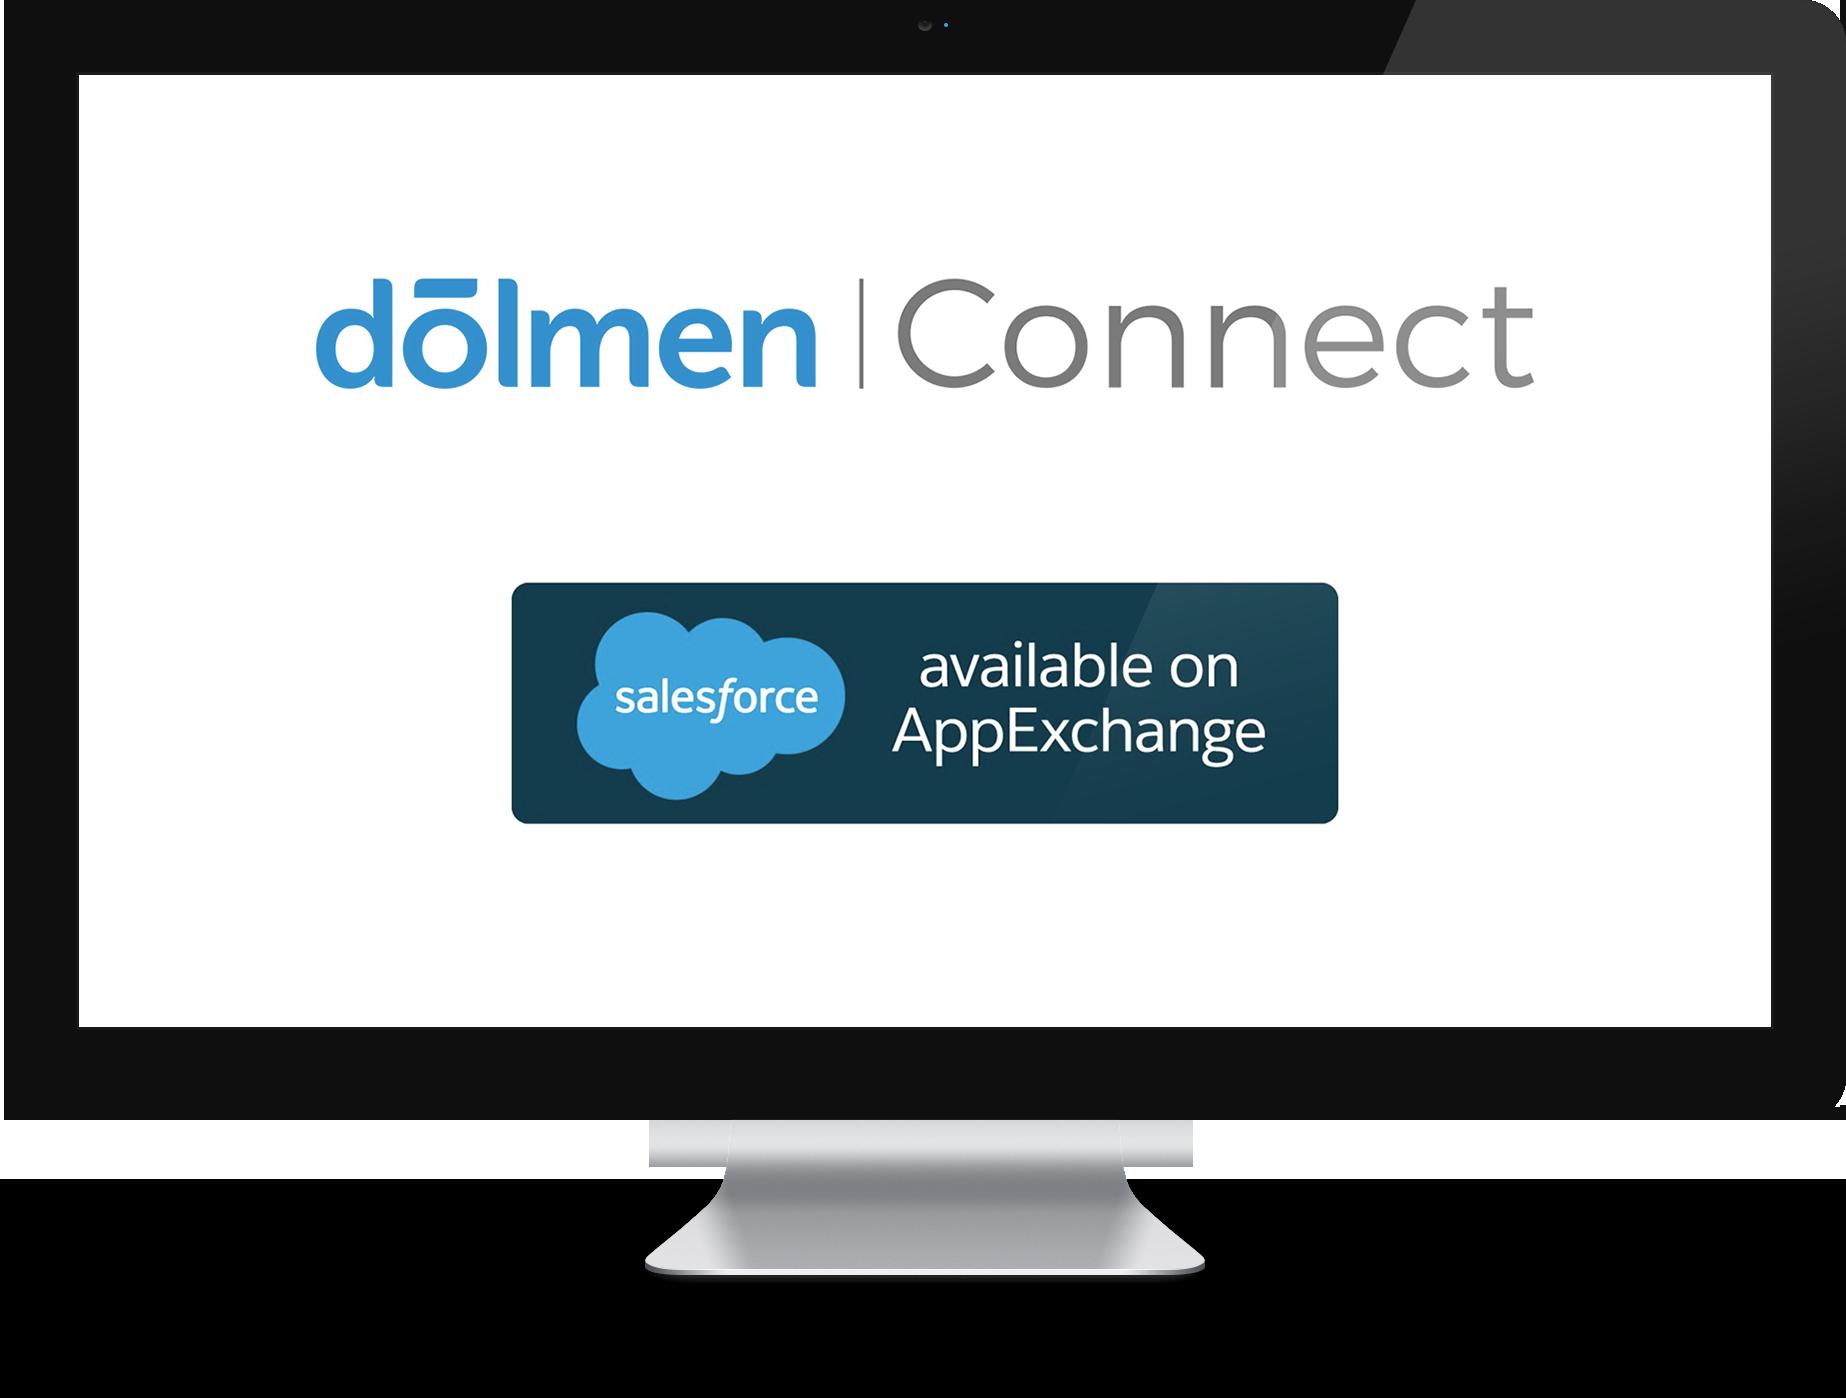 Dolmen Connect